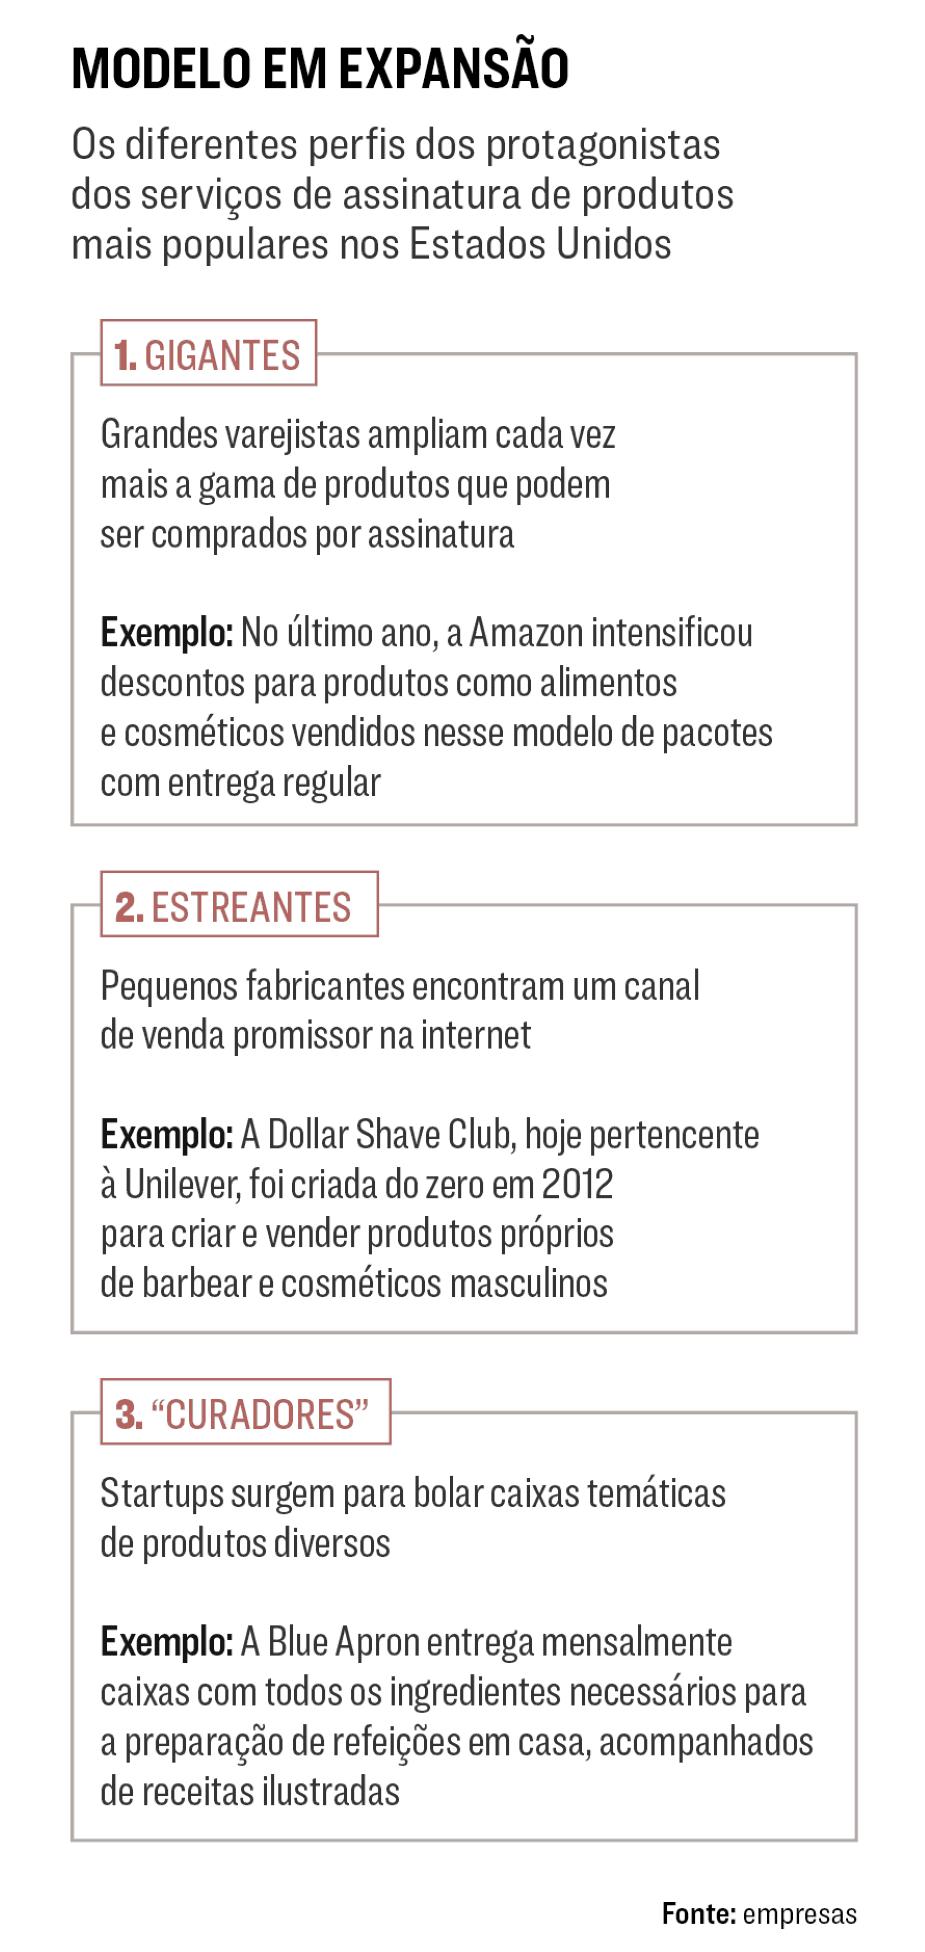 exemplos de empresas que utilizam o modelo de pagamento recorrente